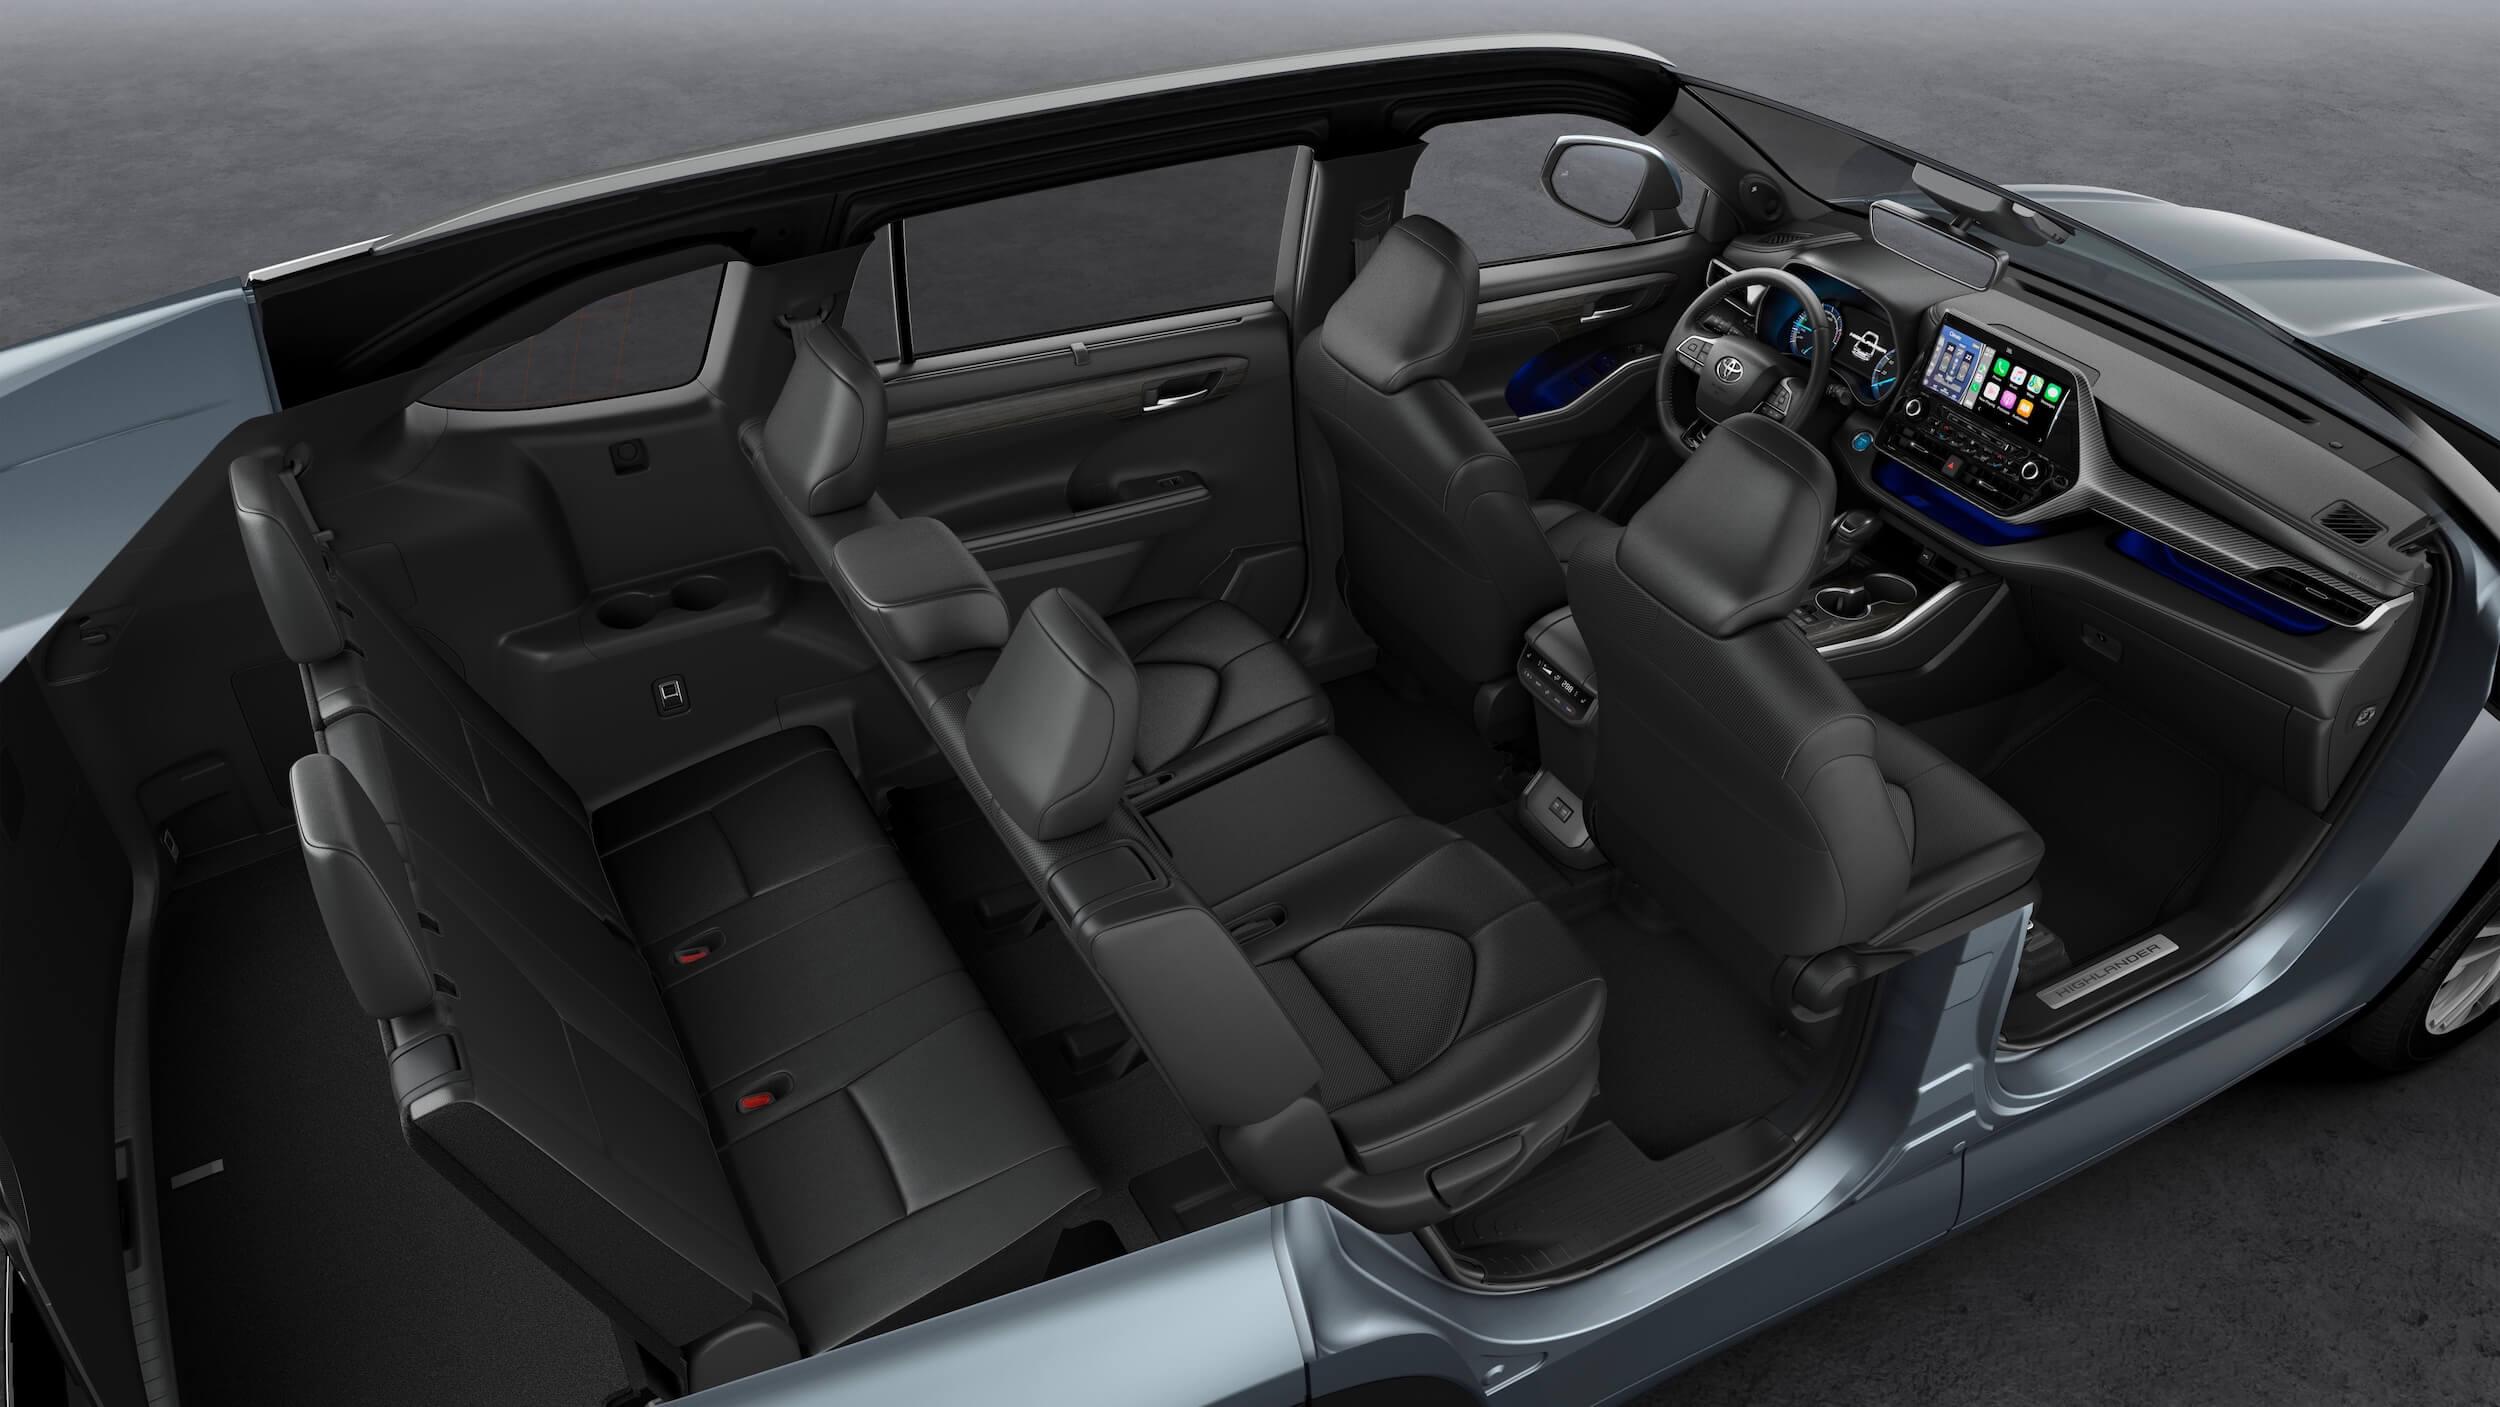 Toyota Highlander 7 zitplaatsen